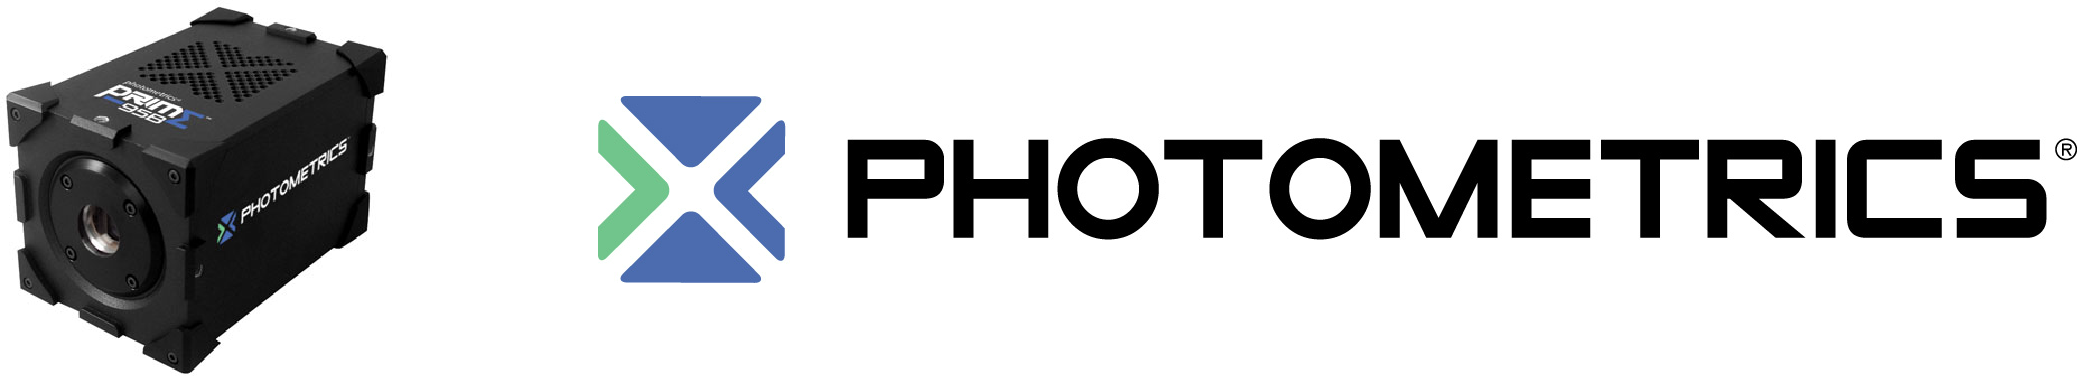 Banner-Photometrics